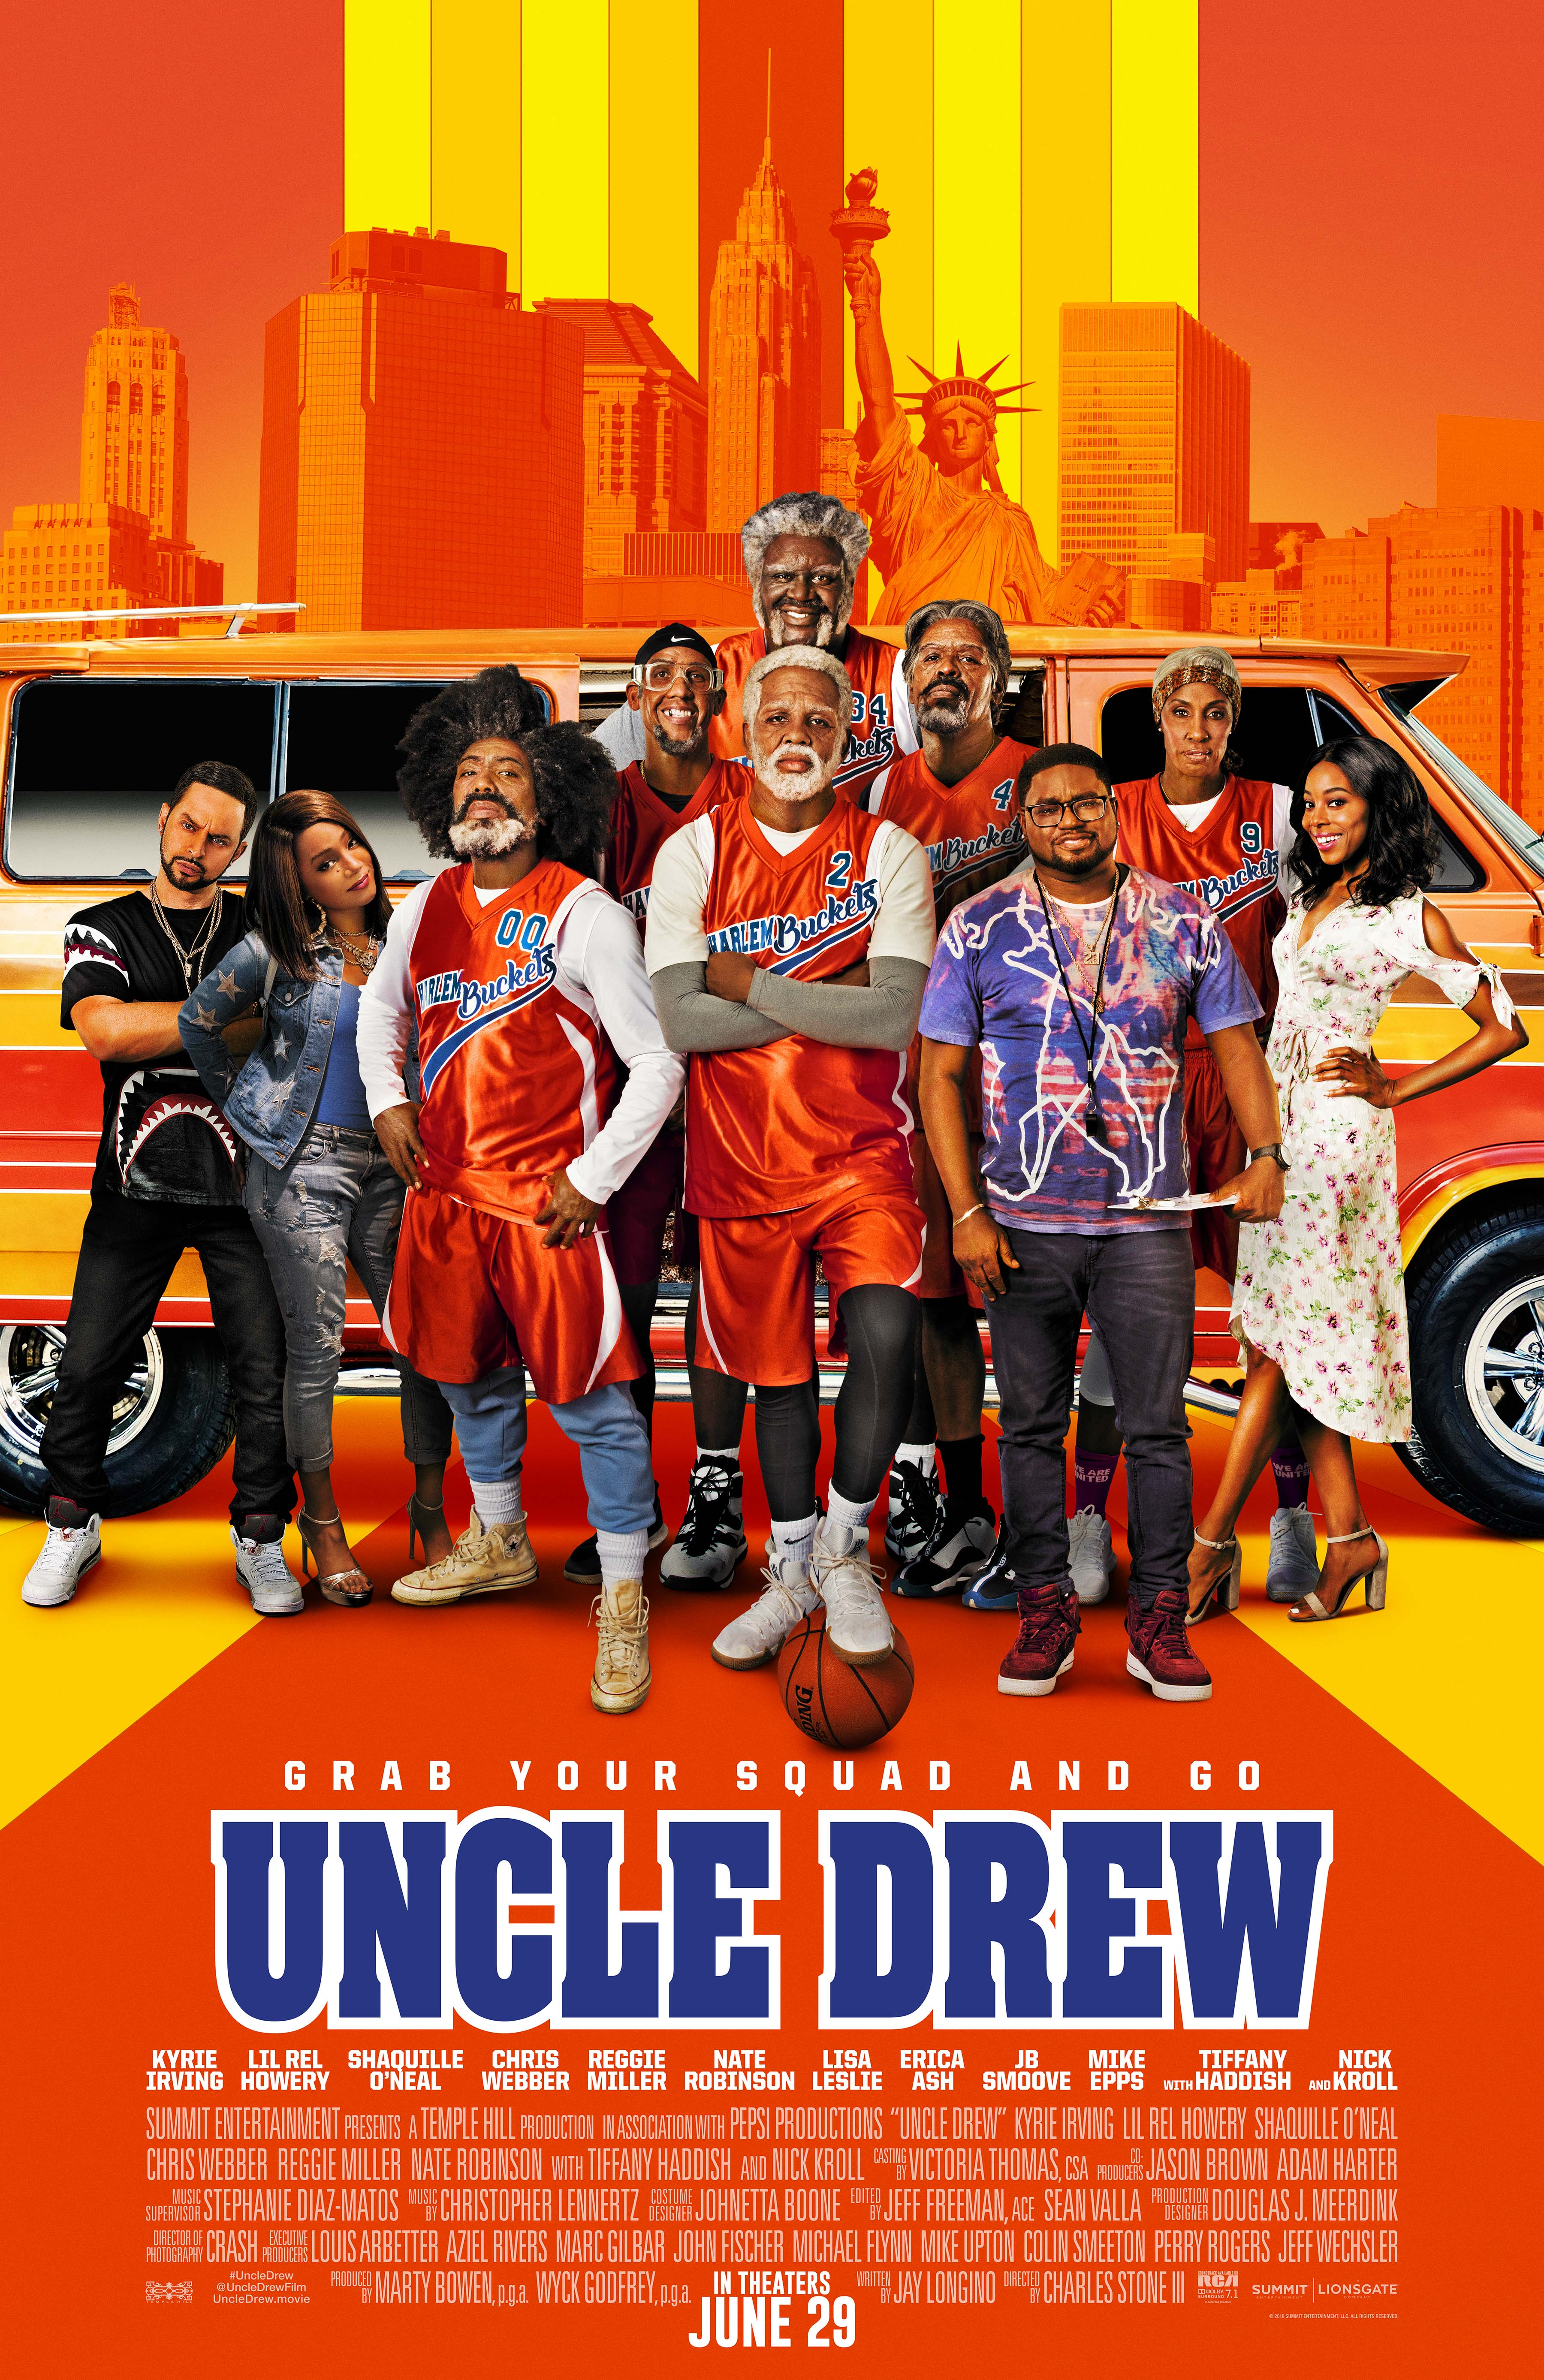 cbdec2ac9717 Uncle Drew at an AMC Theatre near you